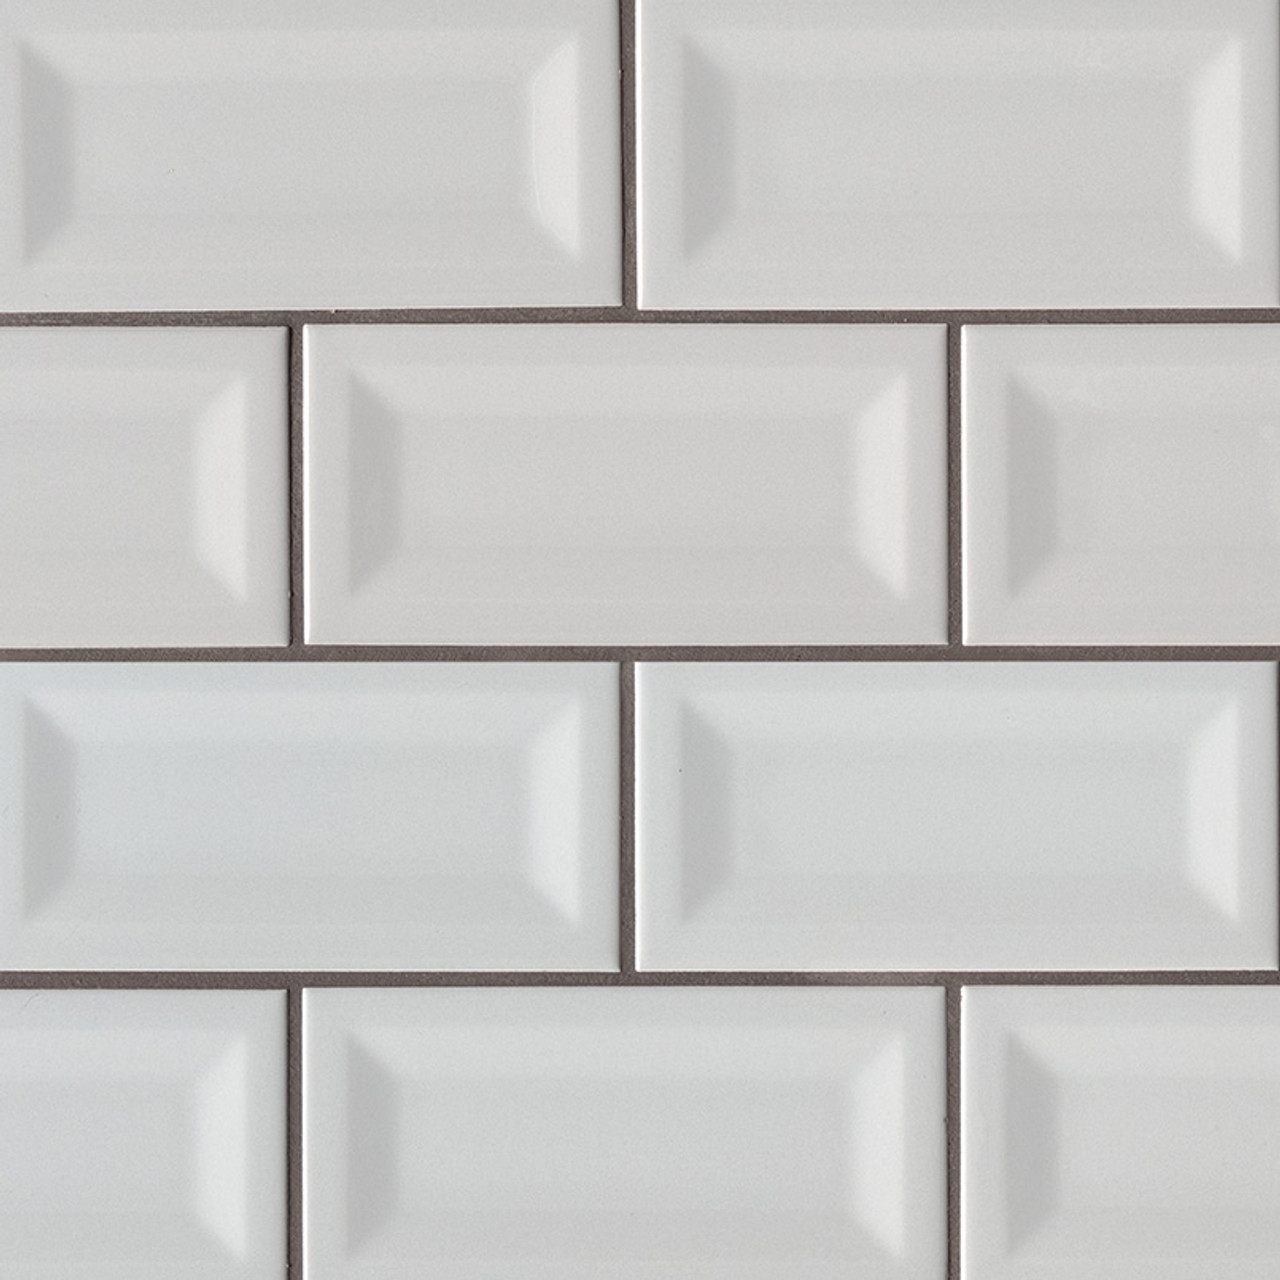 domino gray glossy inverted beveled subway tile 3x6